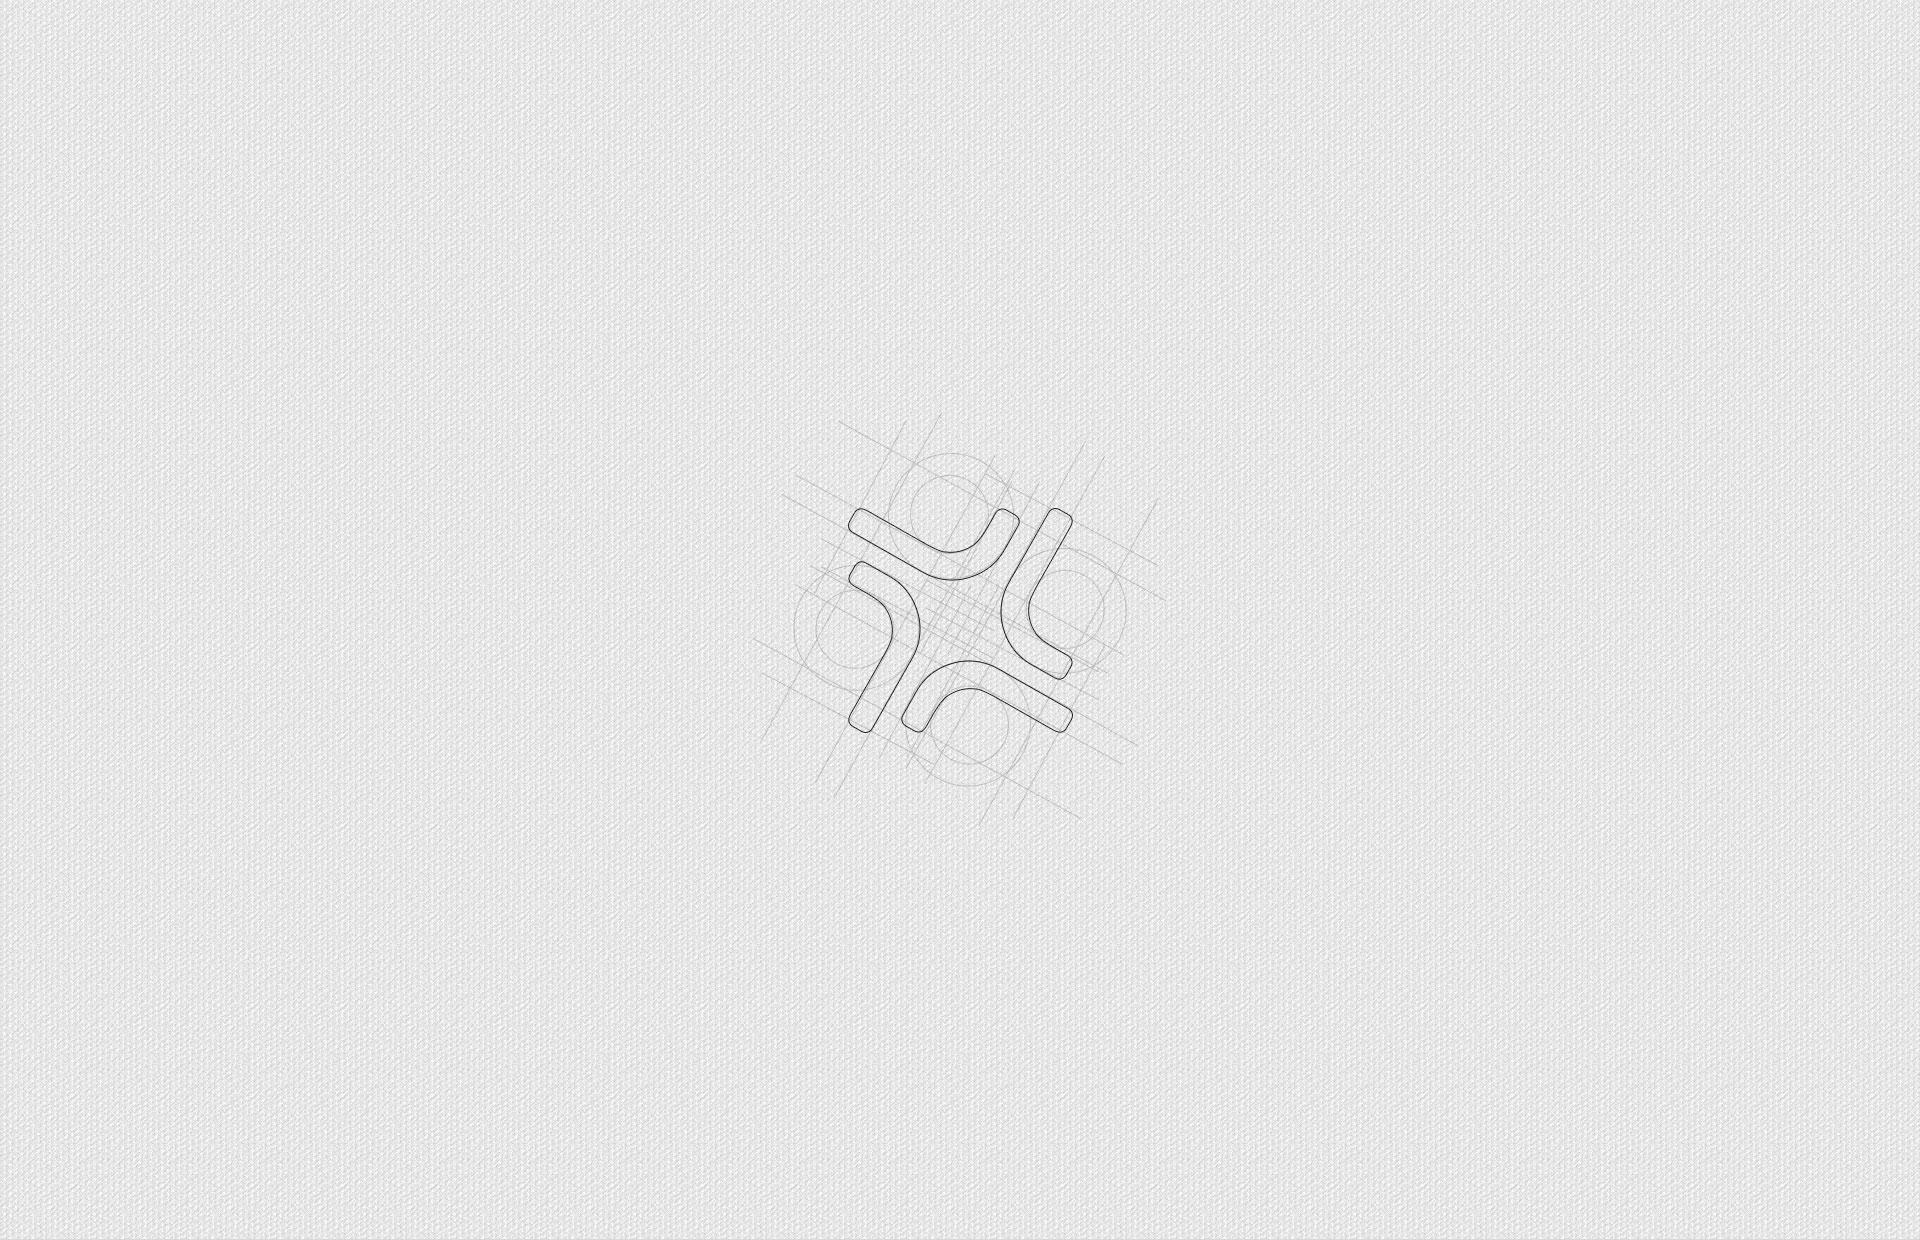 Branding logo sketches 3D printing מיתוג סקיצות עיצוב לוגו הדפסת תלת מימד Largix light